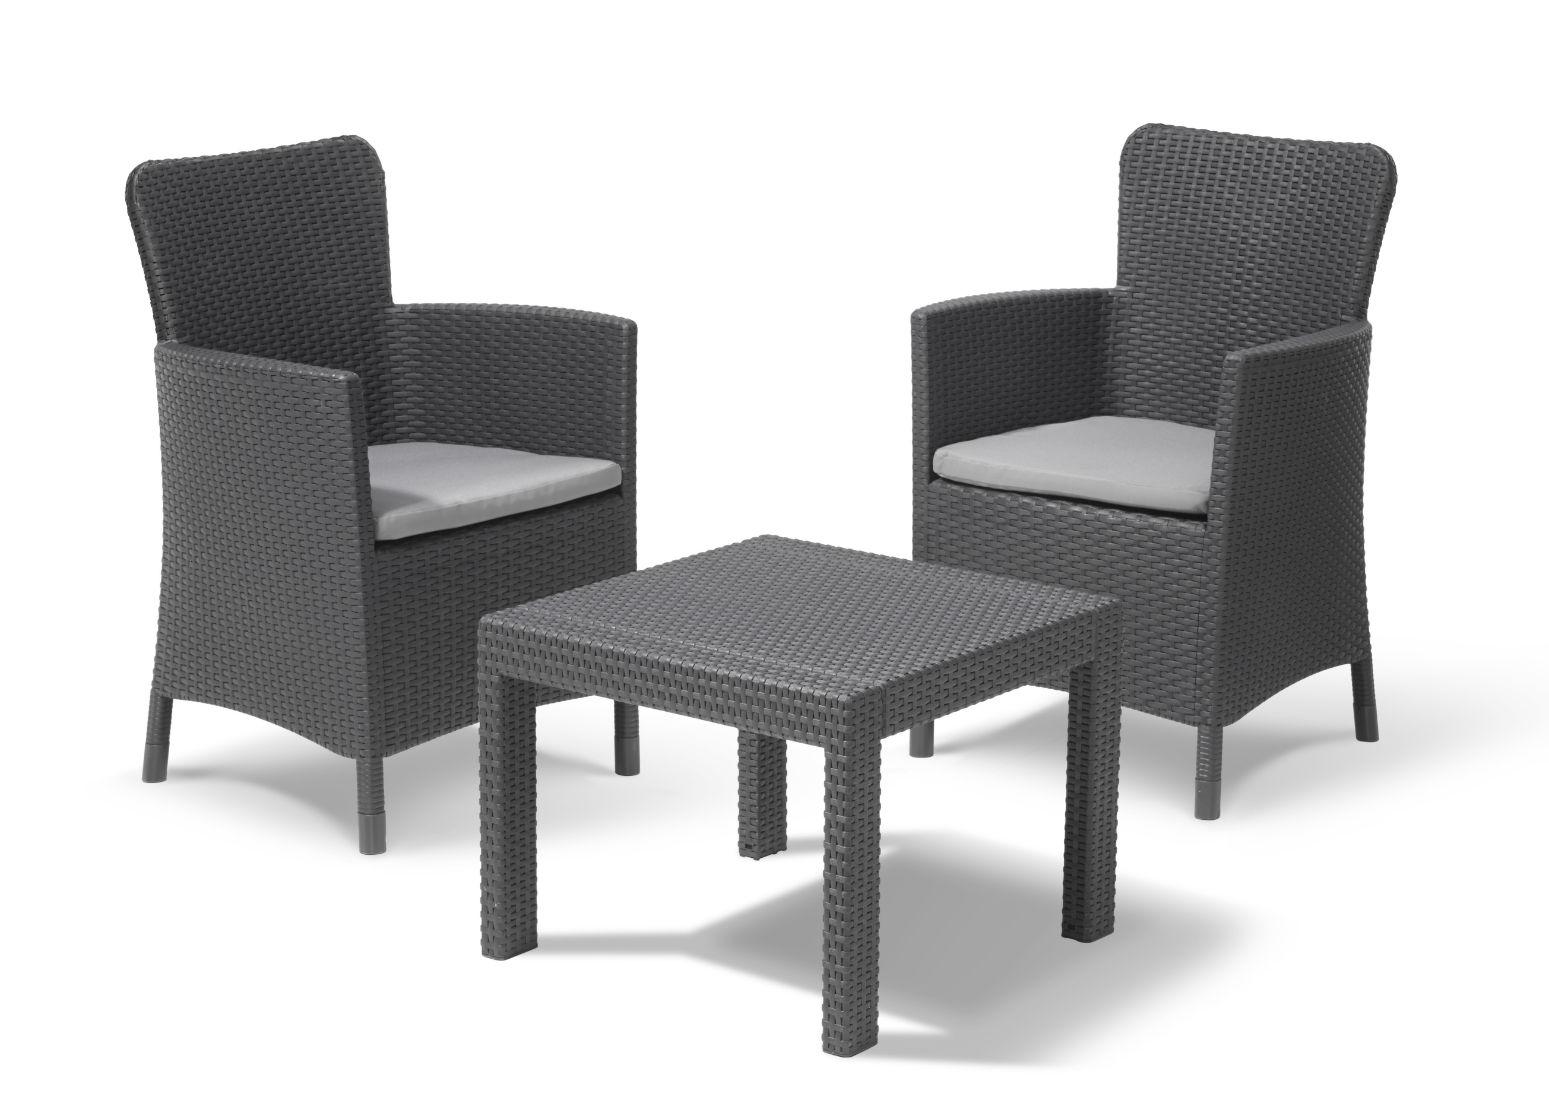 Loungemöbel   Lounge-Gartenmöbel   Lounge Sets - Allibert